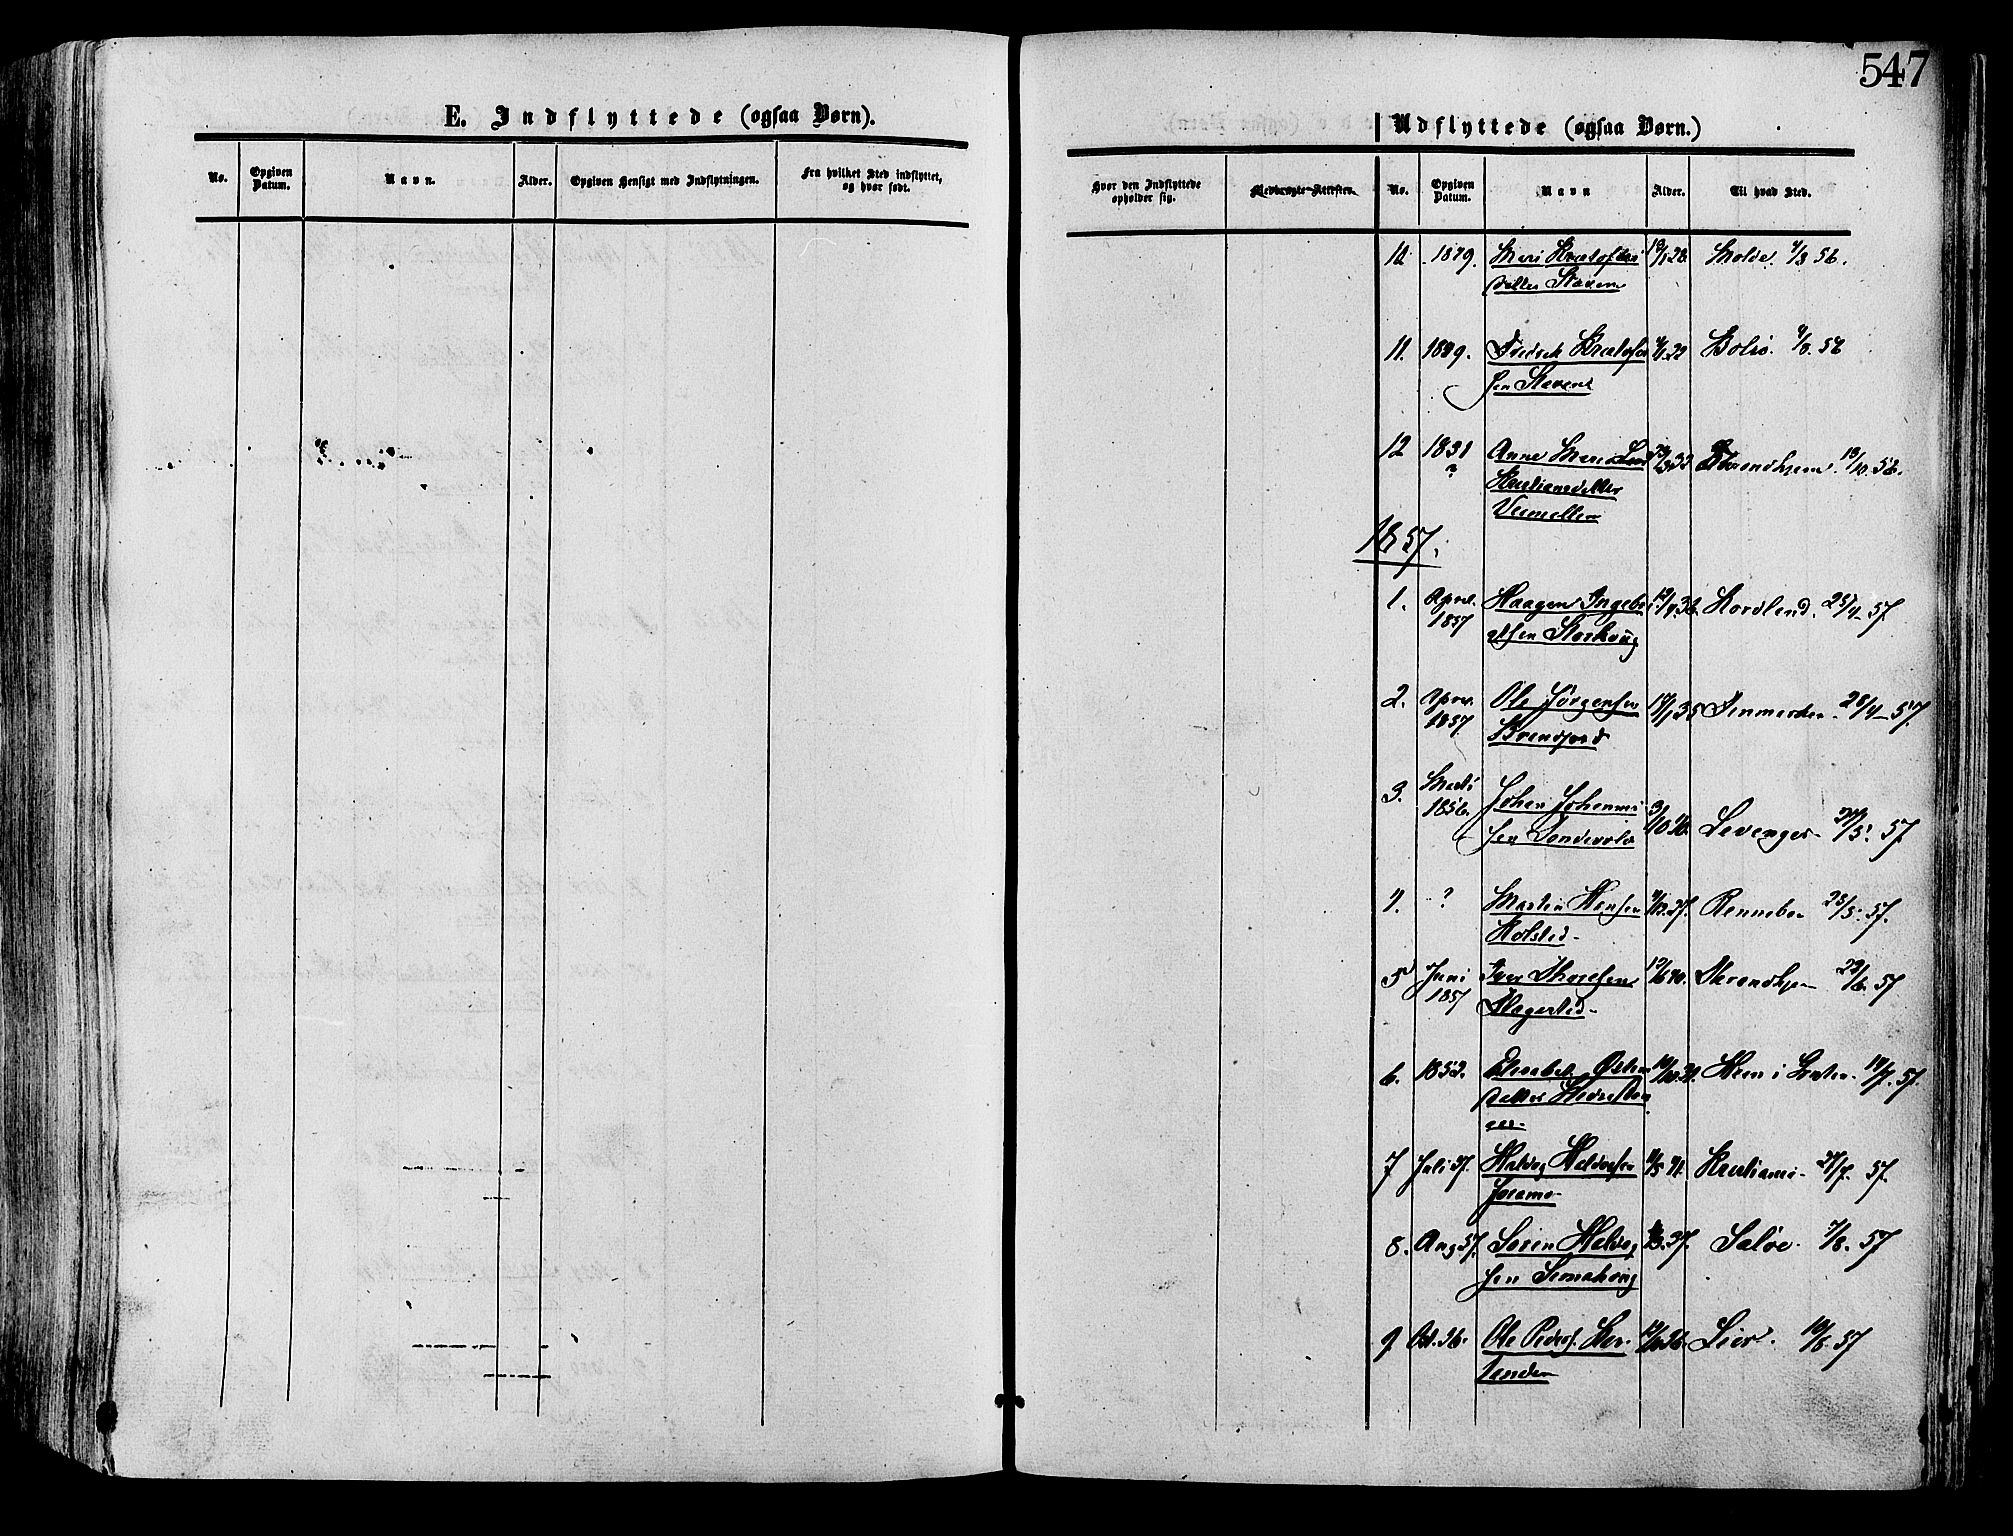 SAH, Lesja prestekontor, Ministerialbok nr. 8, 1854-1880, s. 547